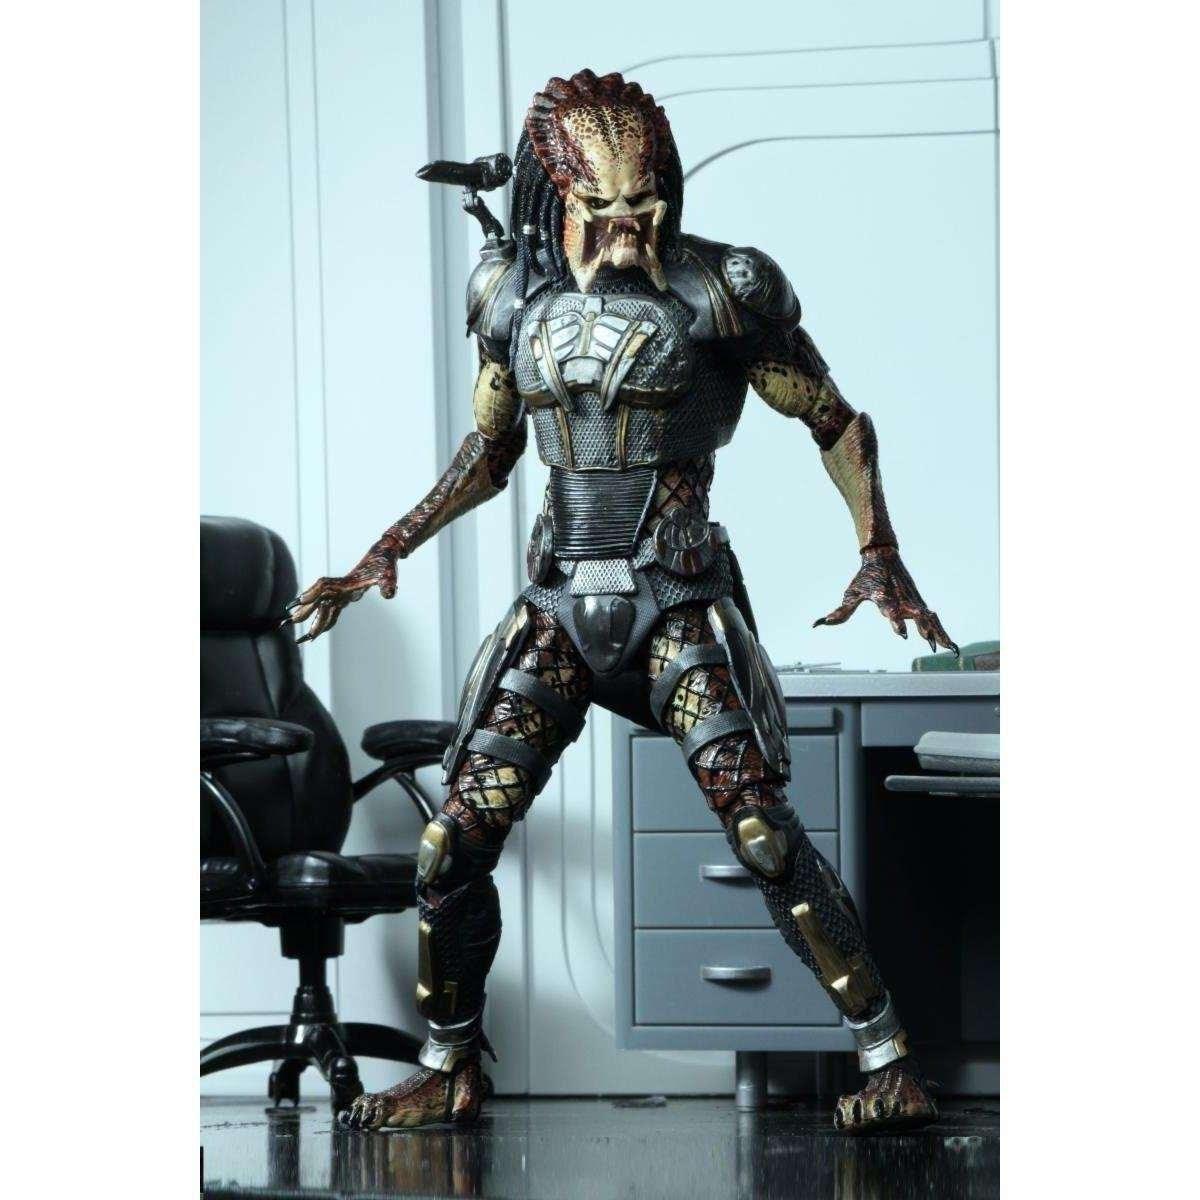 Image of The Predator Ultimate Predator Action Figure